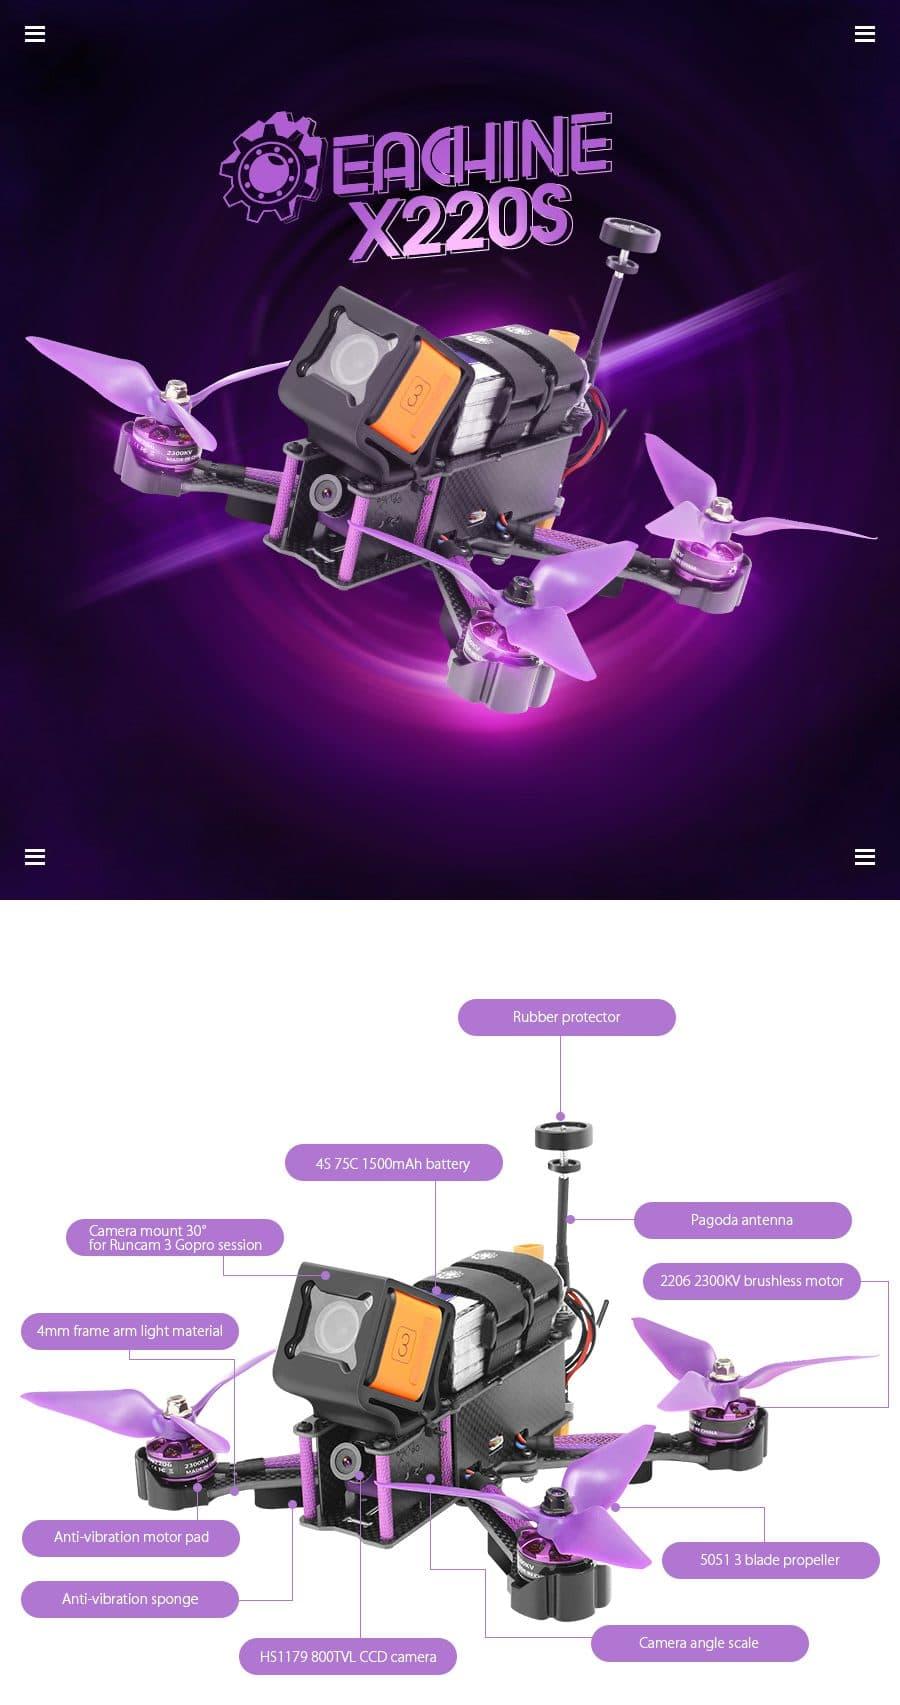 Гоночный квадрокоптерEachine Wizard X220S купить на Алиэкспресс